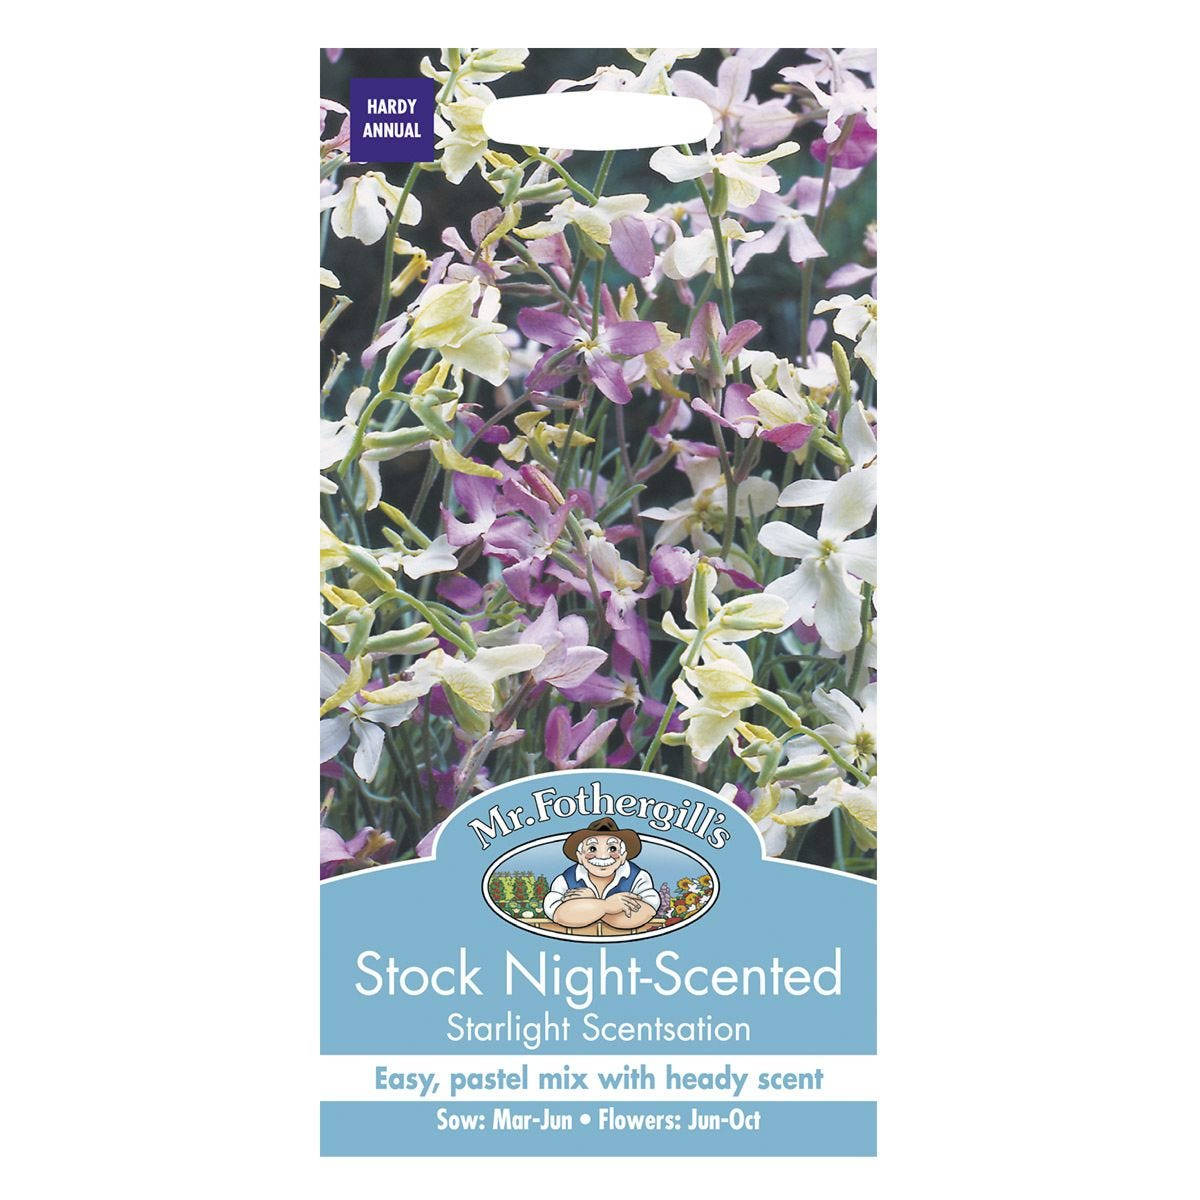 Mr Fothergill's Stock Night Scented Starlight Scentsation Seeds